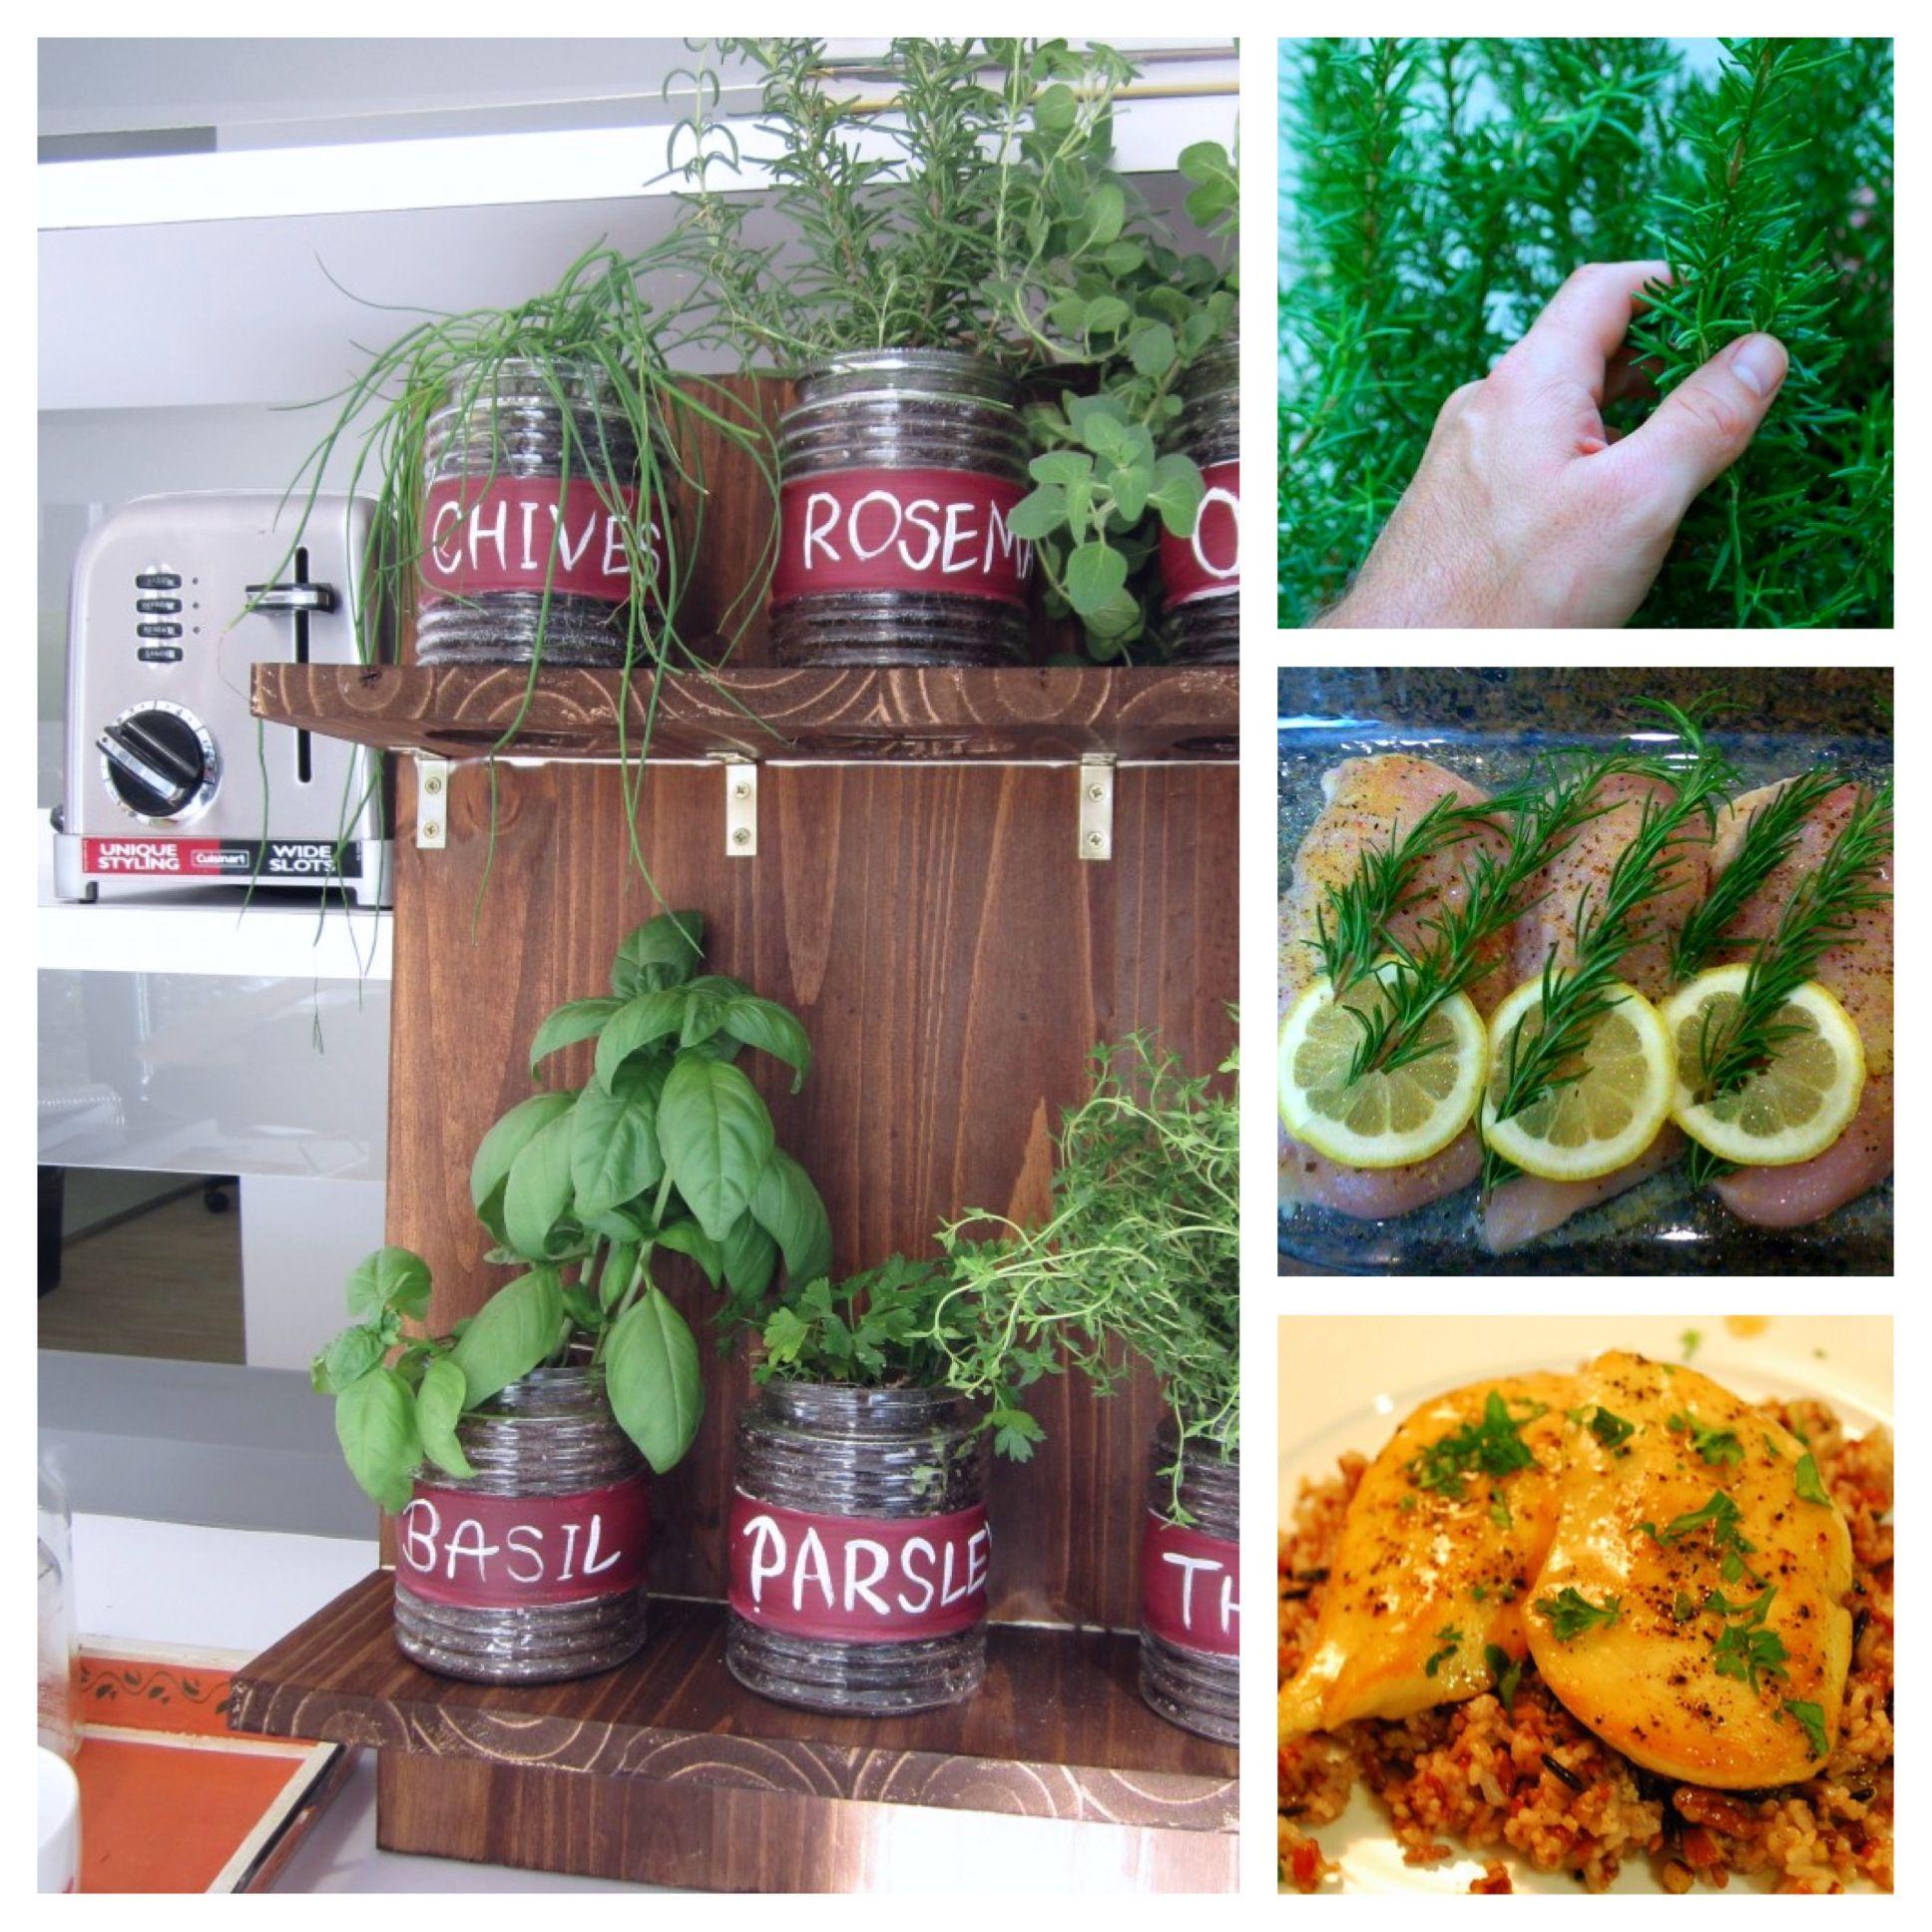 Simple Kitchen Garden: Grow An Indoor Garden With Fresh Herbs